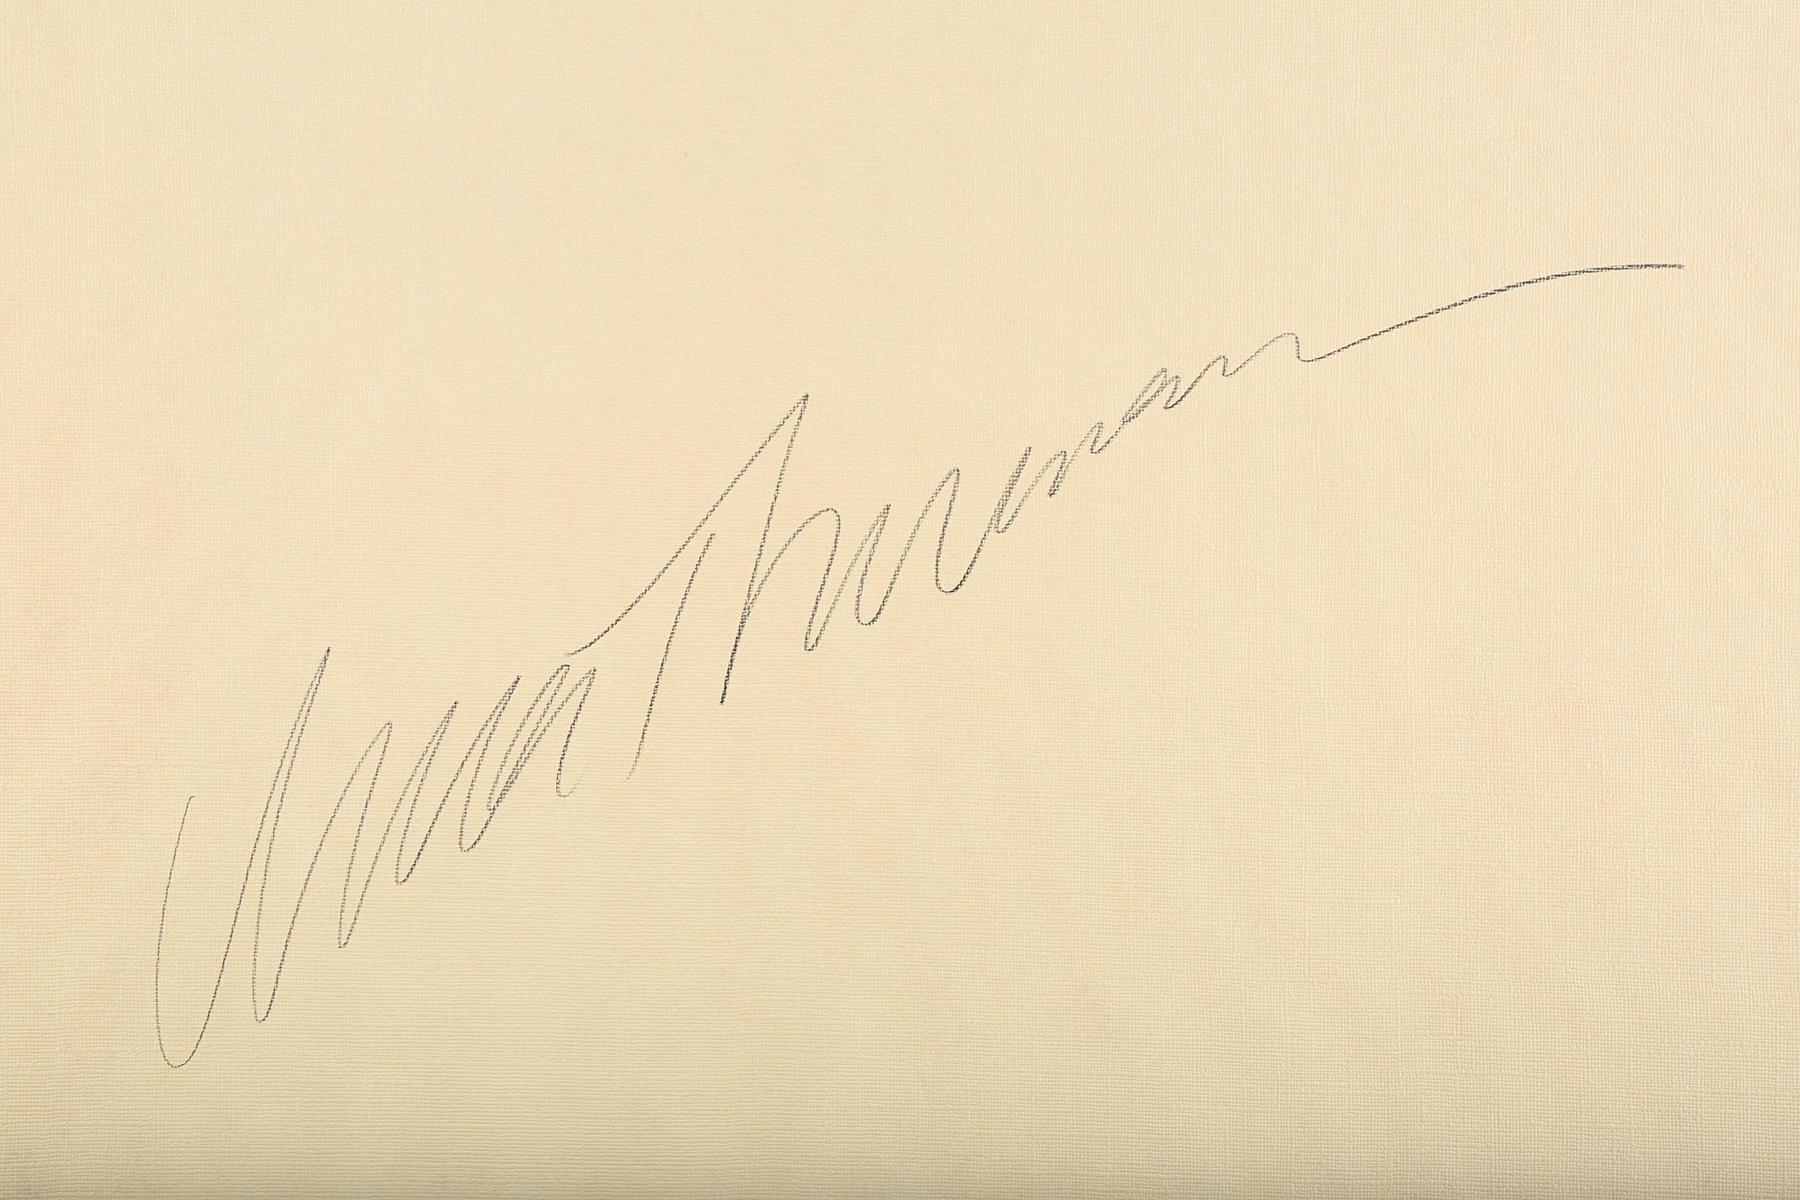 KILL BILL: VOLUME II (2004) - Japanese B1, 2004, Autographed by Uma Thurman - Image 4 of 5